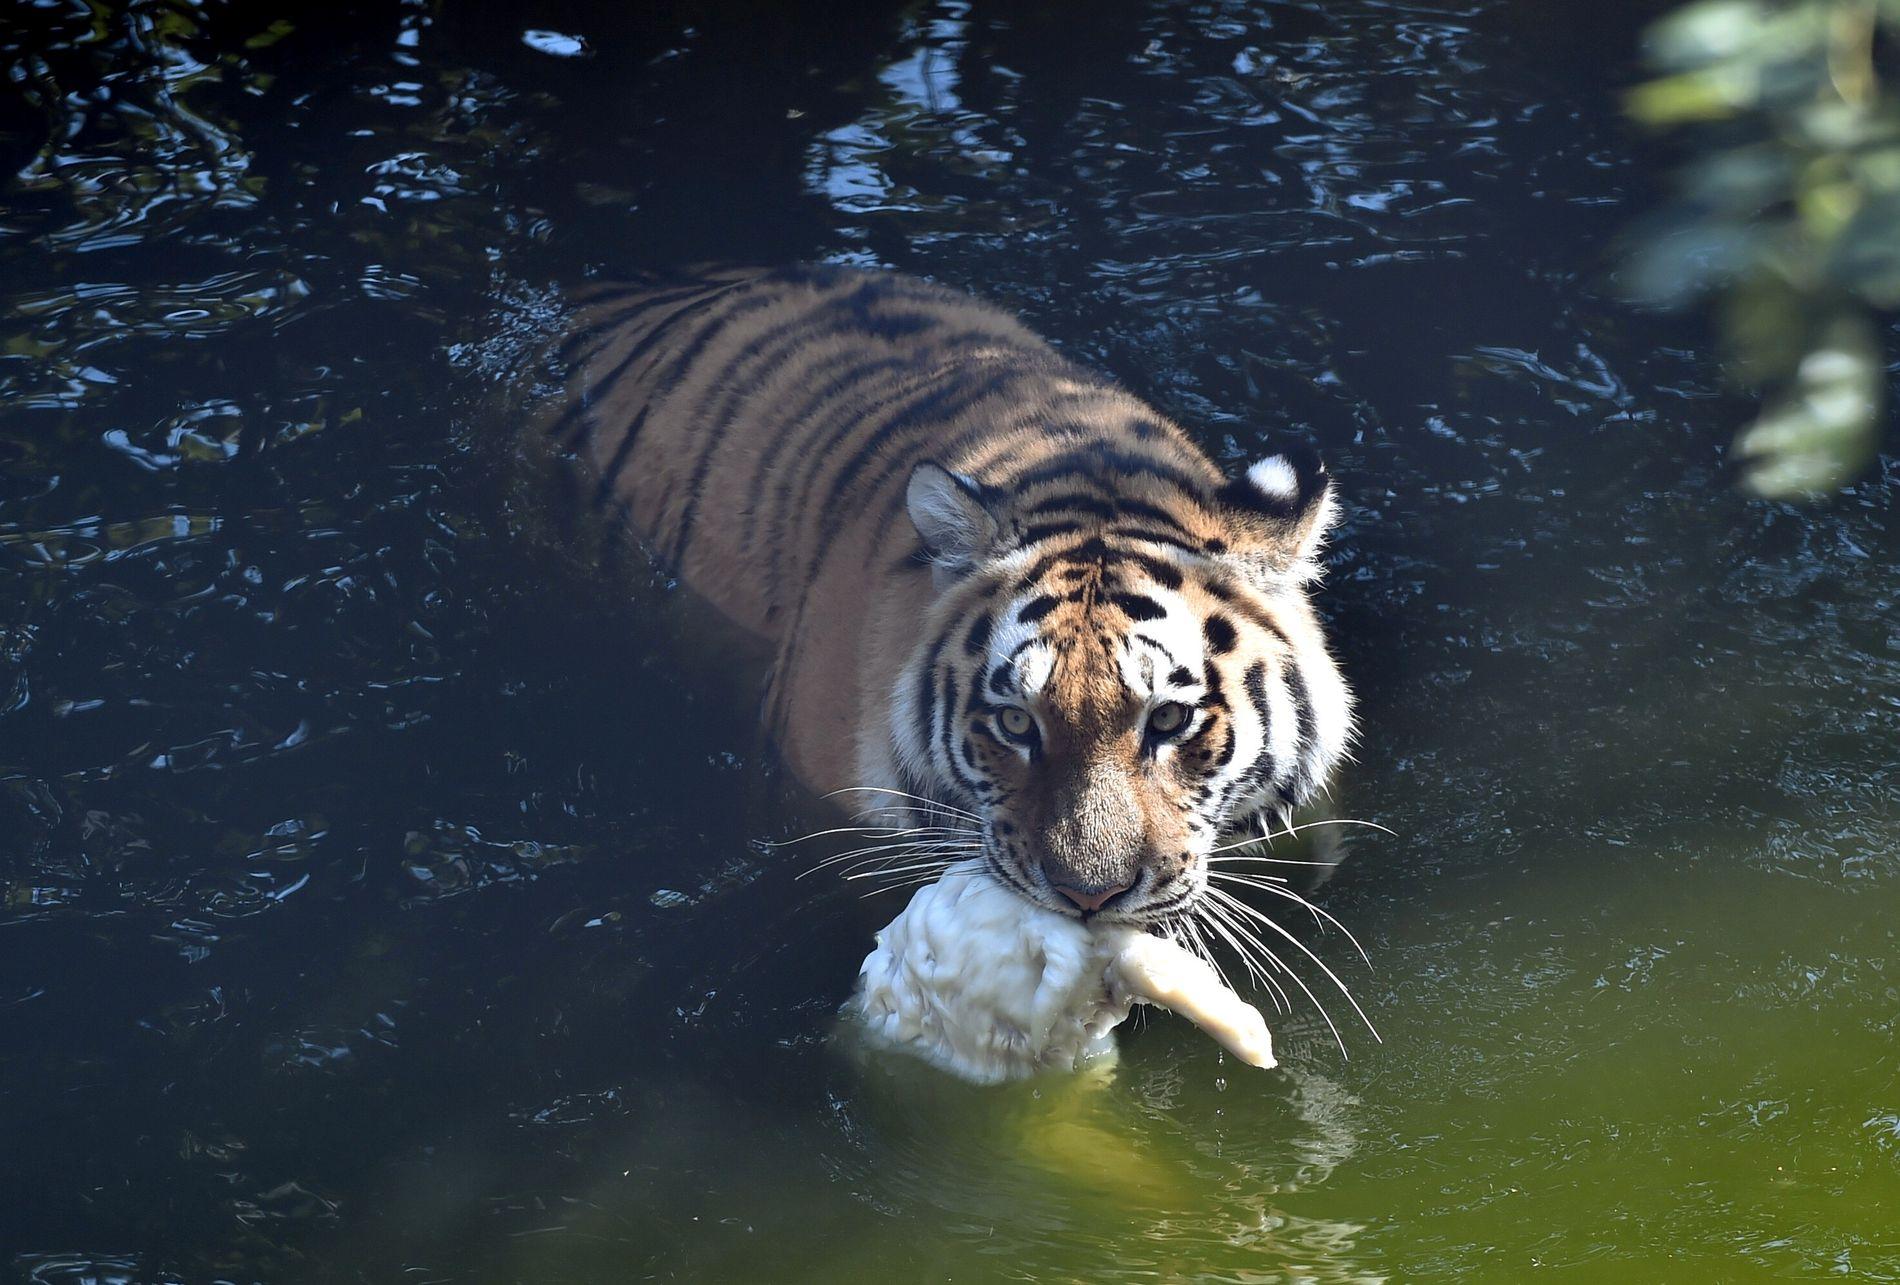 SVØMMETUR: En tiger i Korkeasaari Zoo i Finland nyter en kald matbit i bassenget.